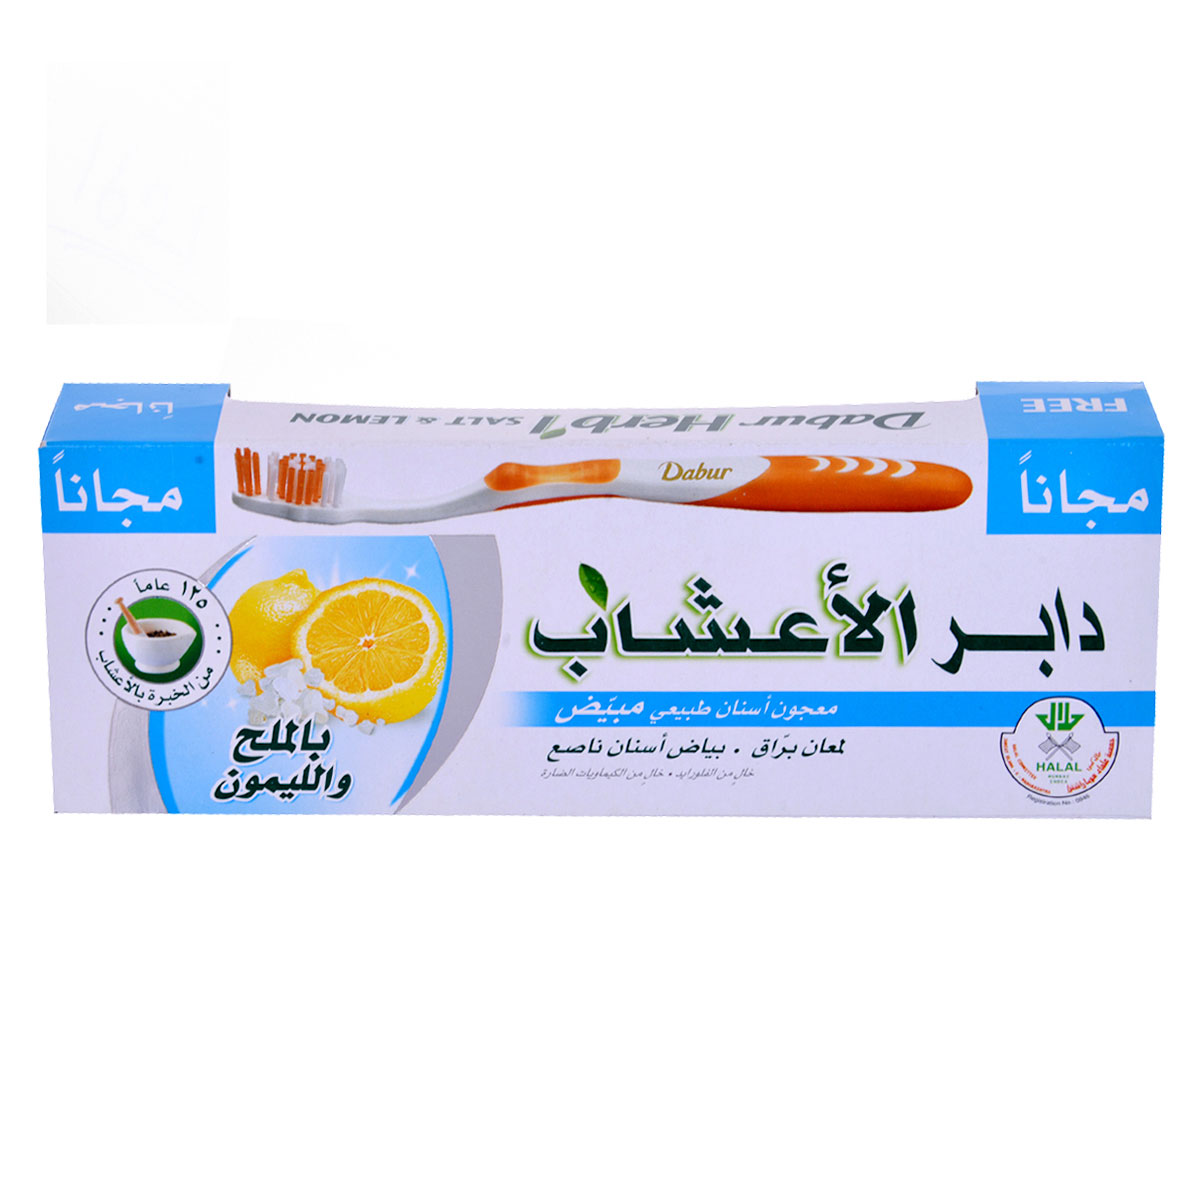 معجون اسنان 150 جرام  دابر الاعشاب مع فرشاه بالملح والليمون